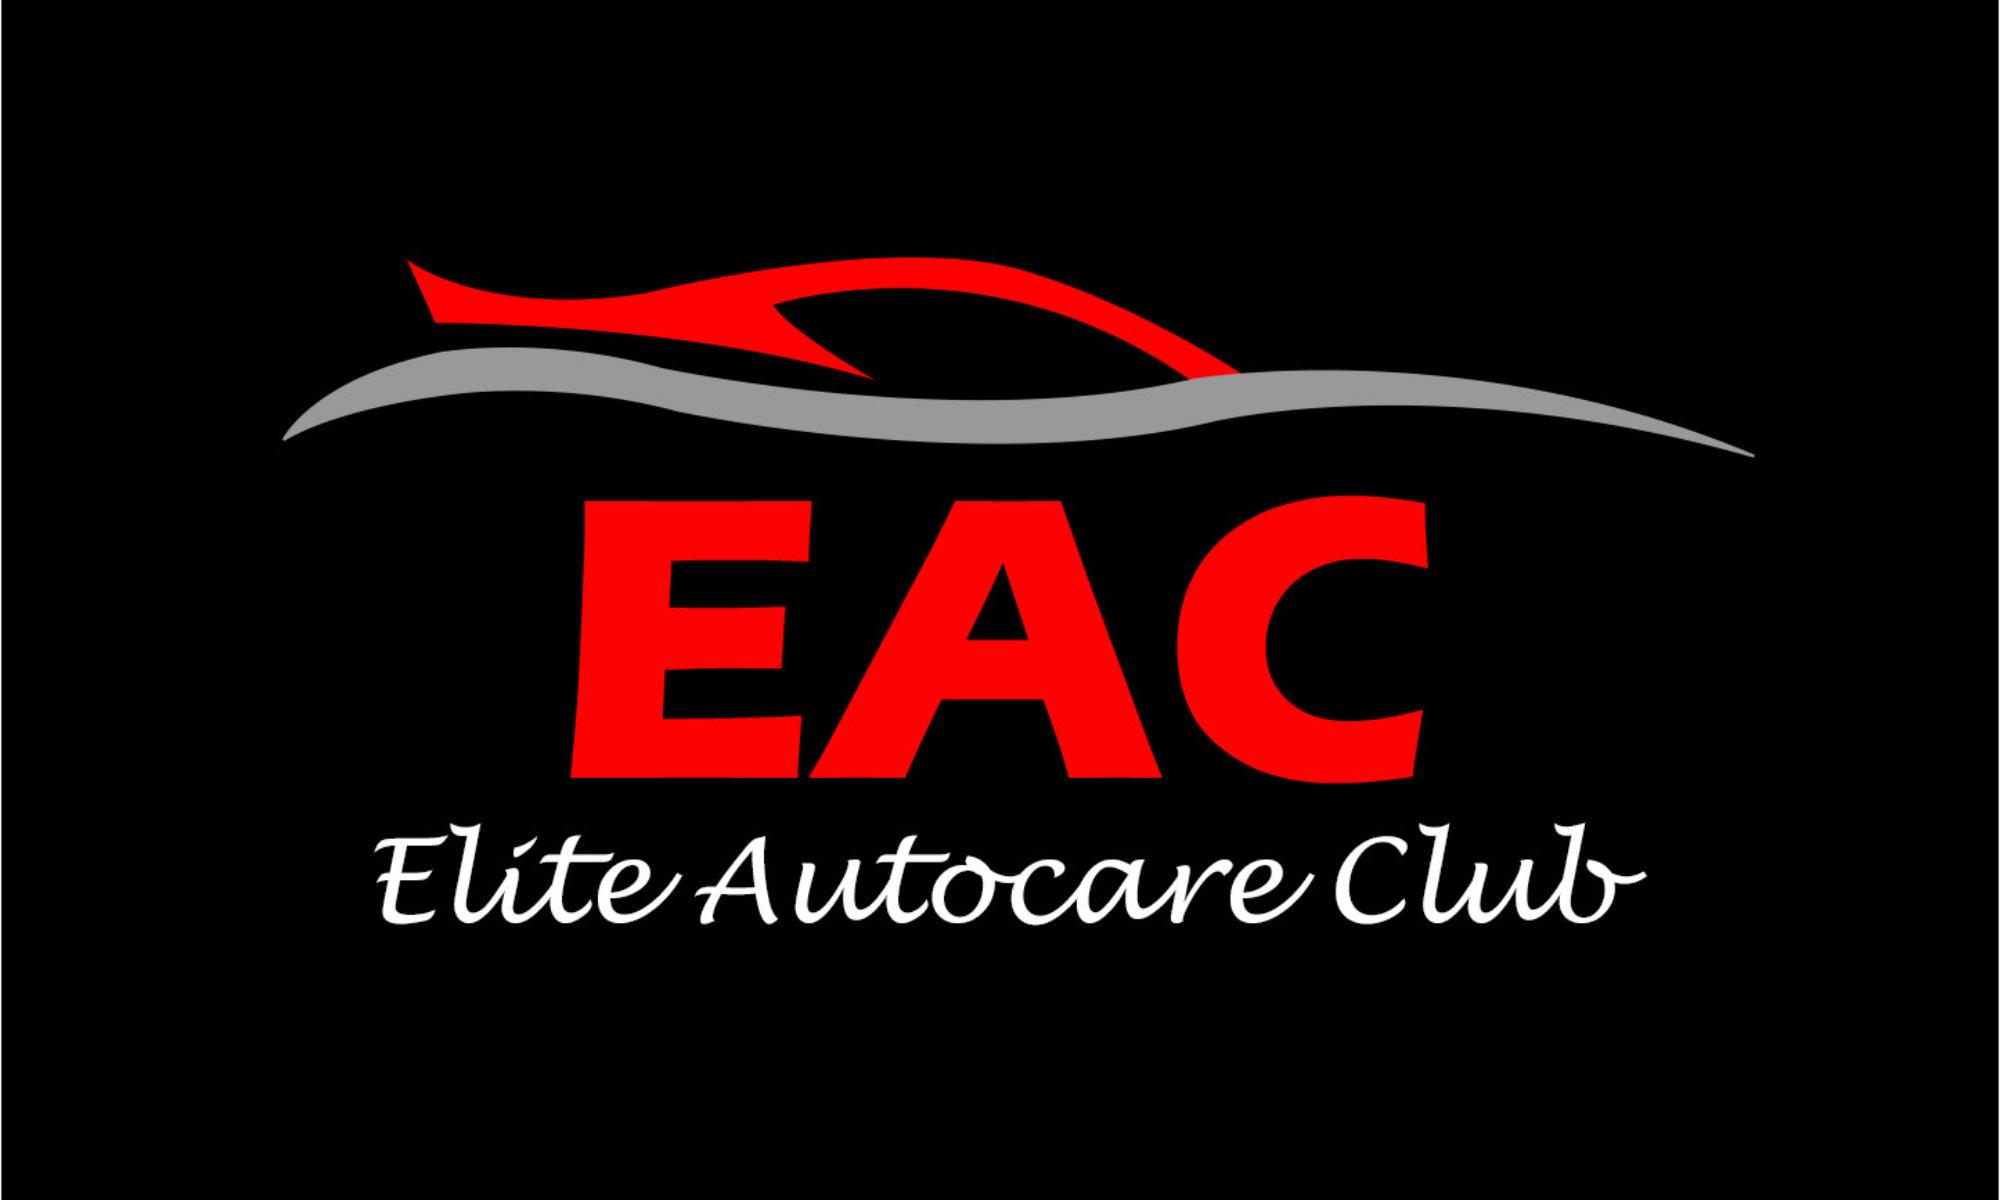 EAC website